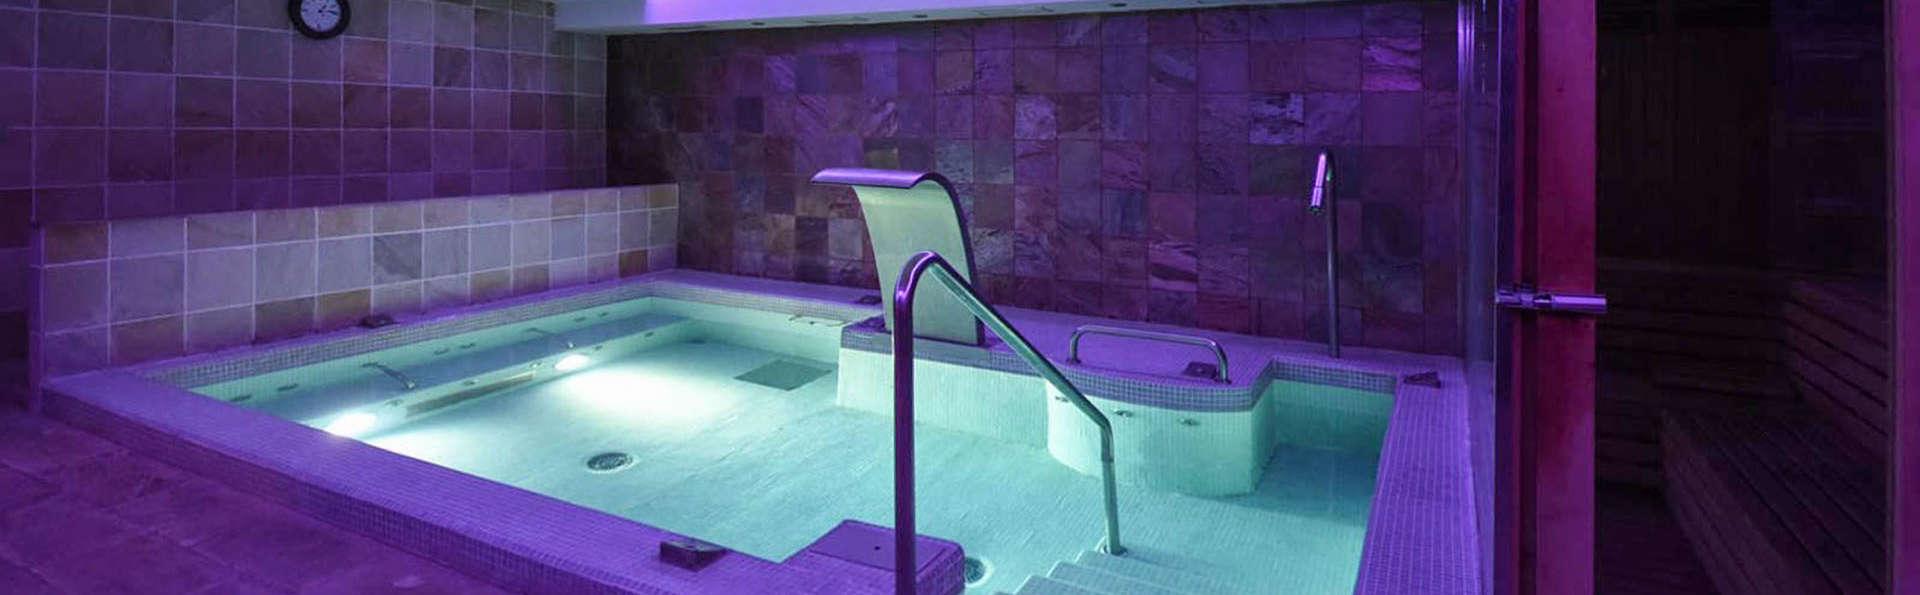 Hotel Spa Puerta Vadinia - EDIT_POOL_01_1_.jpg